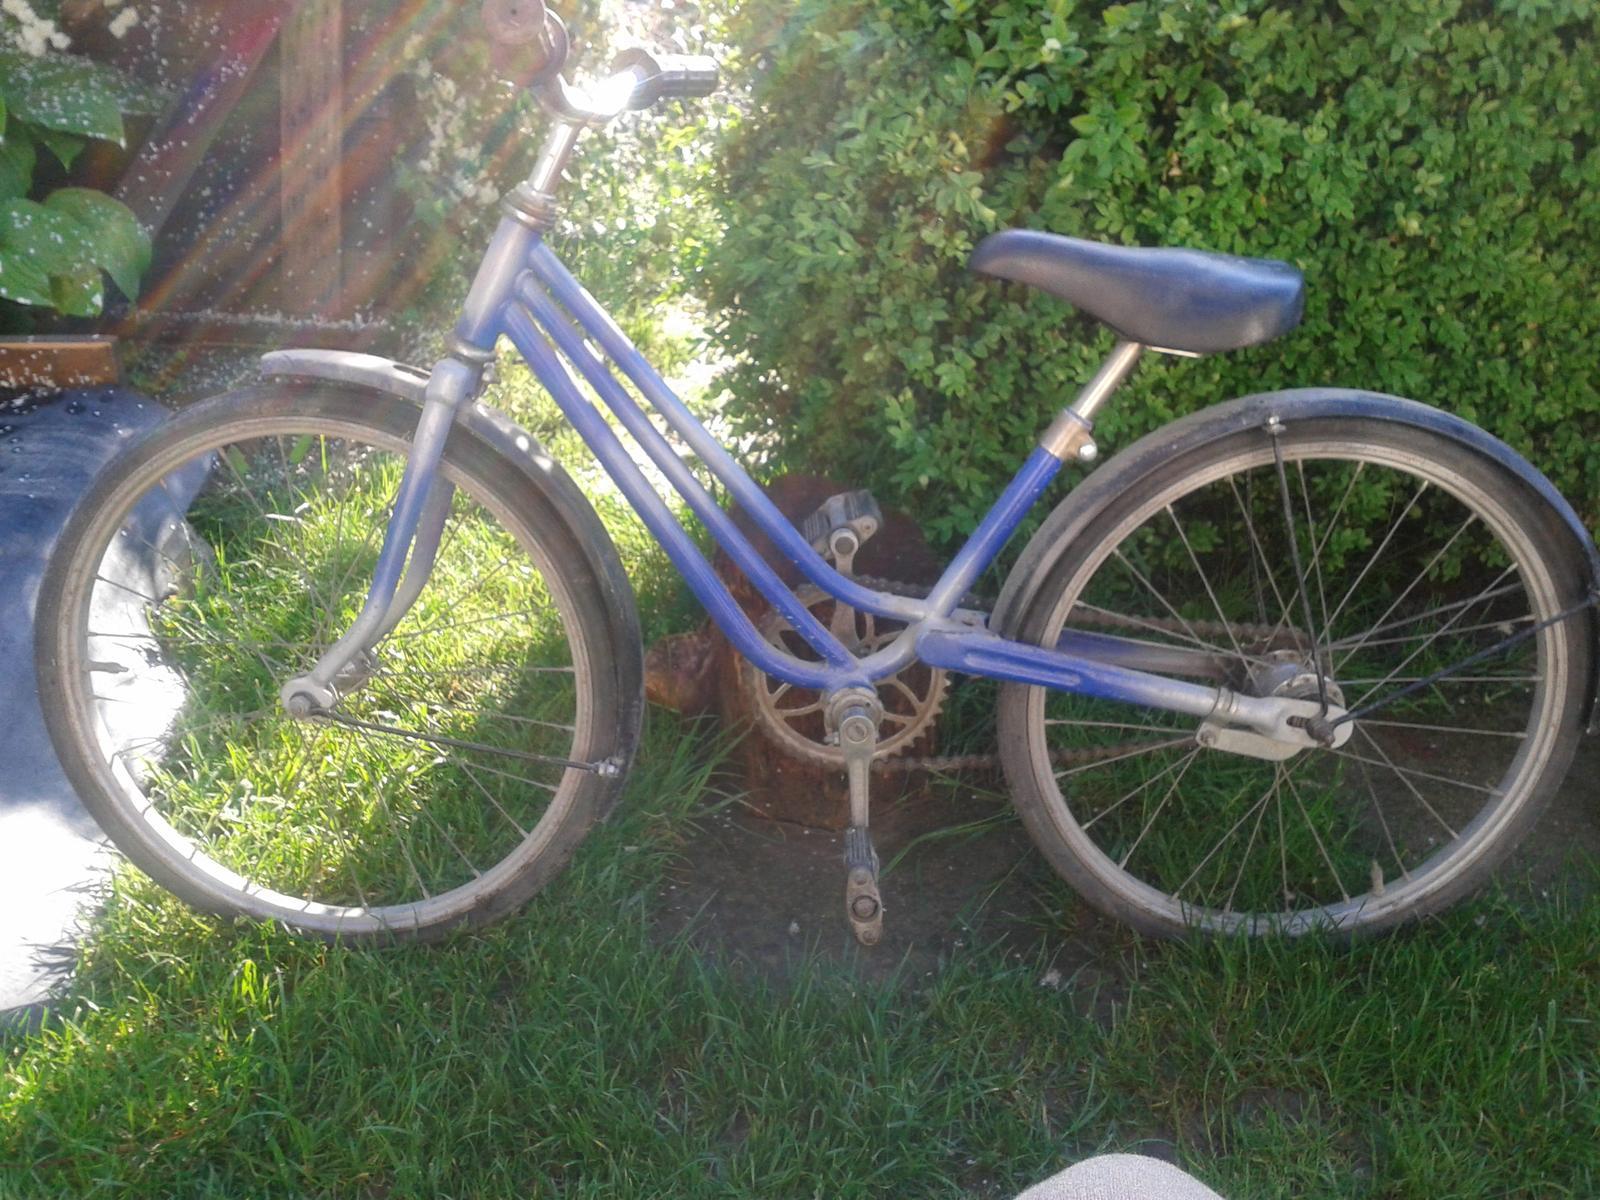 detsky retro bicykel - Obrázok č. 1